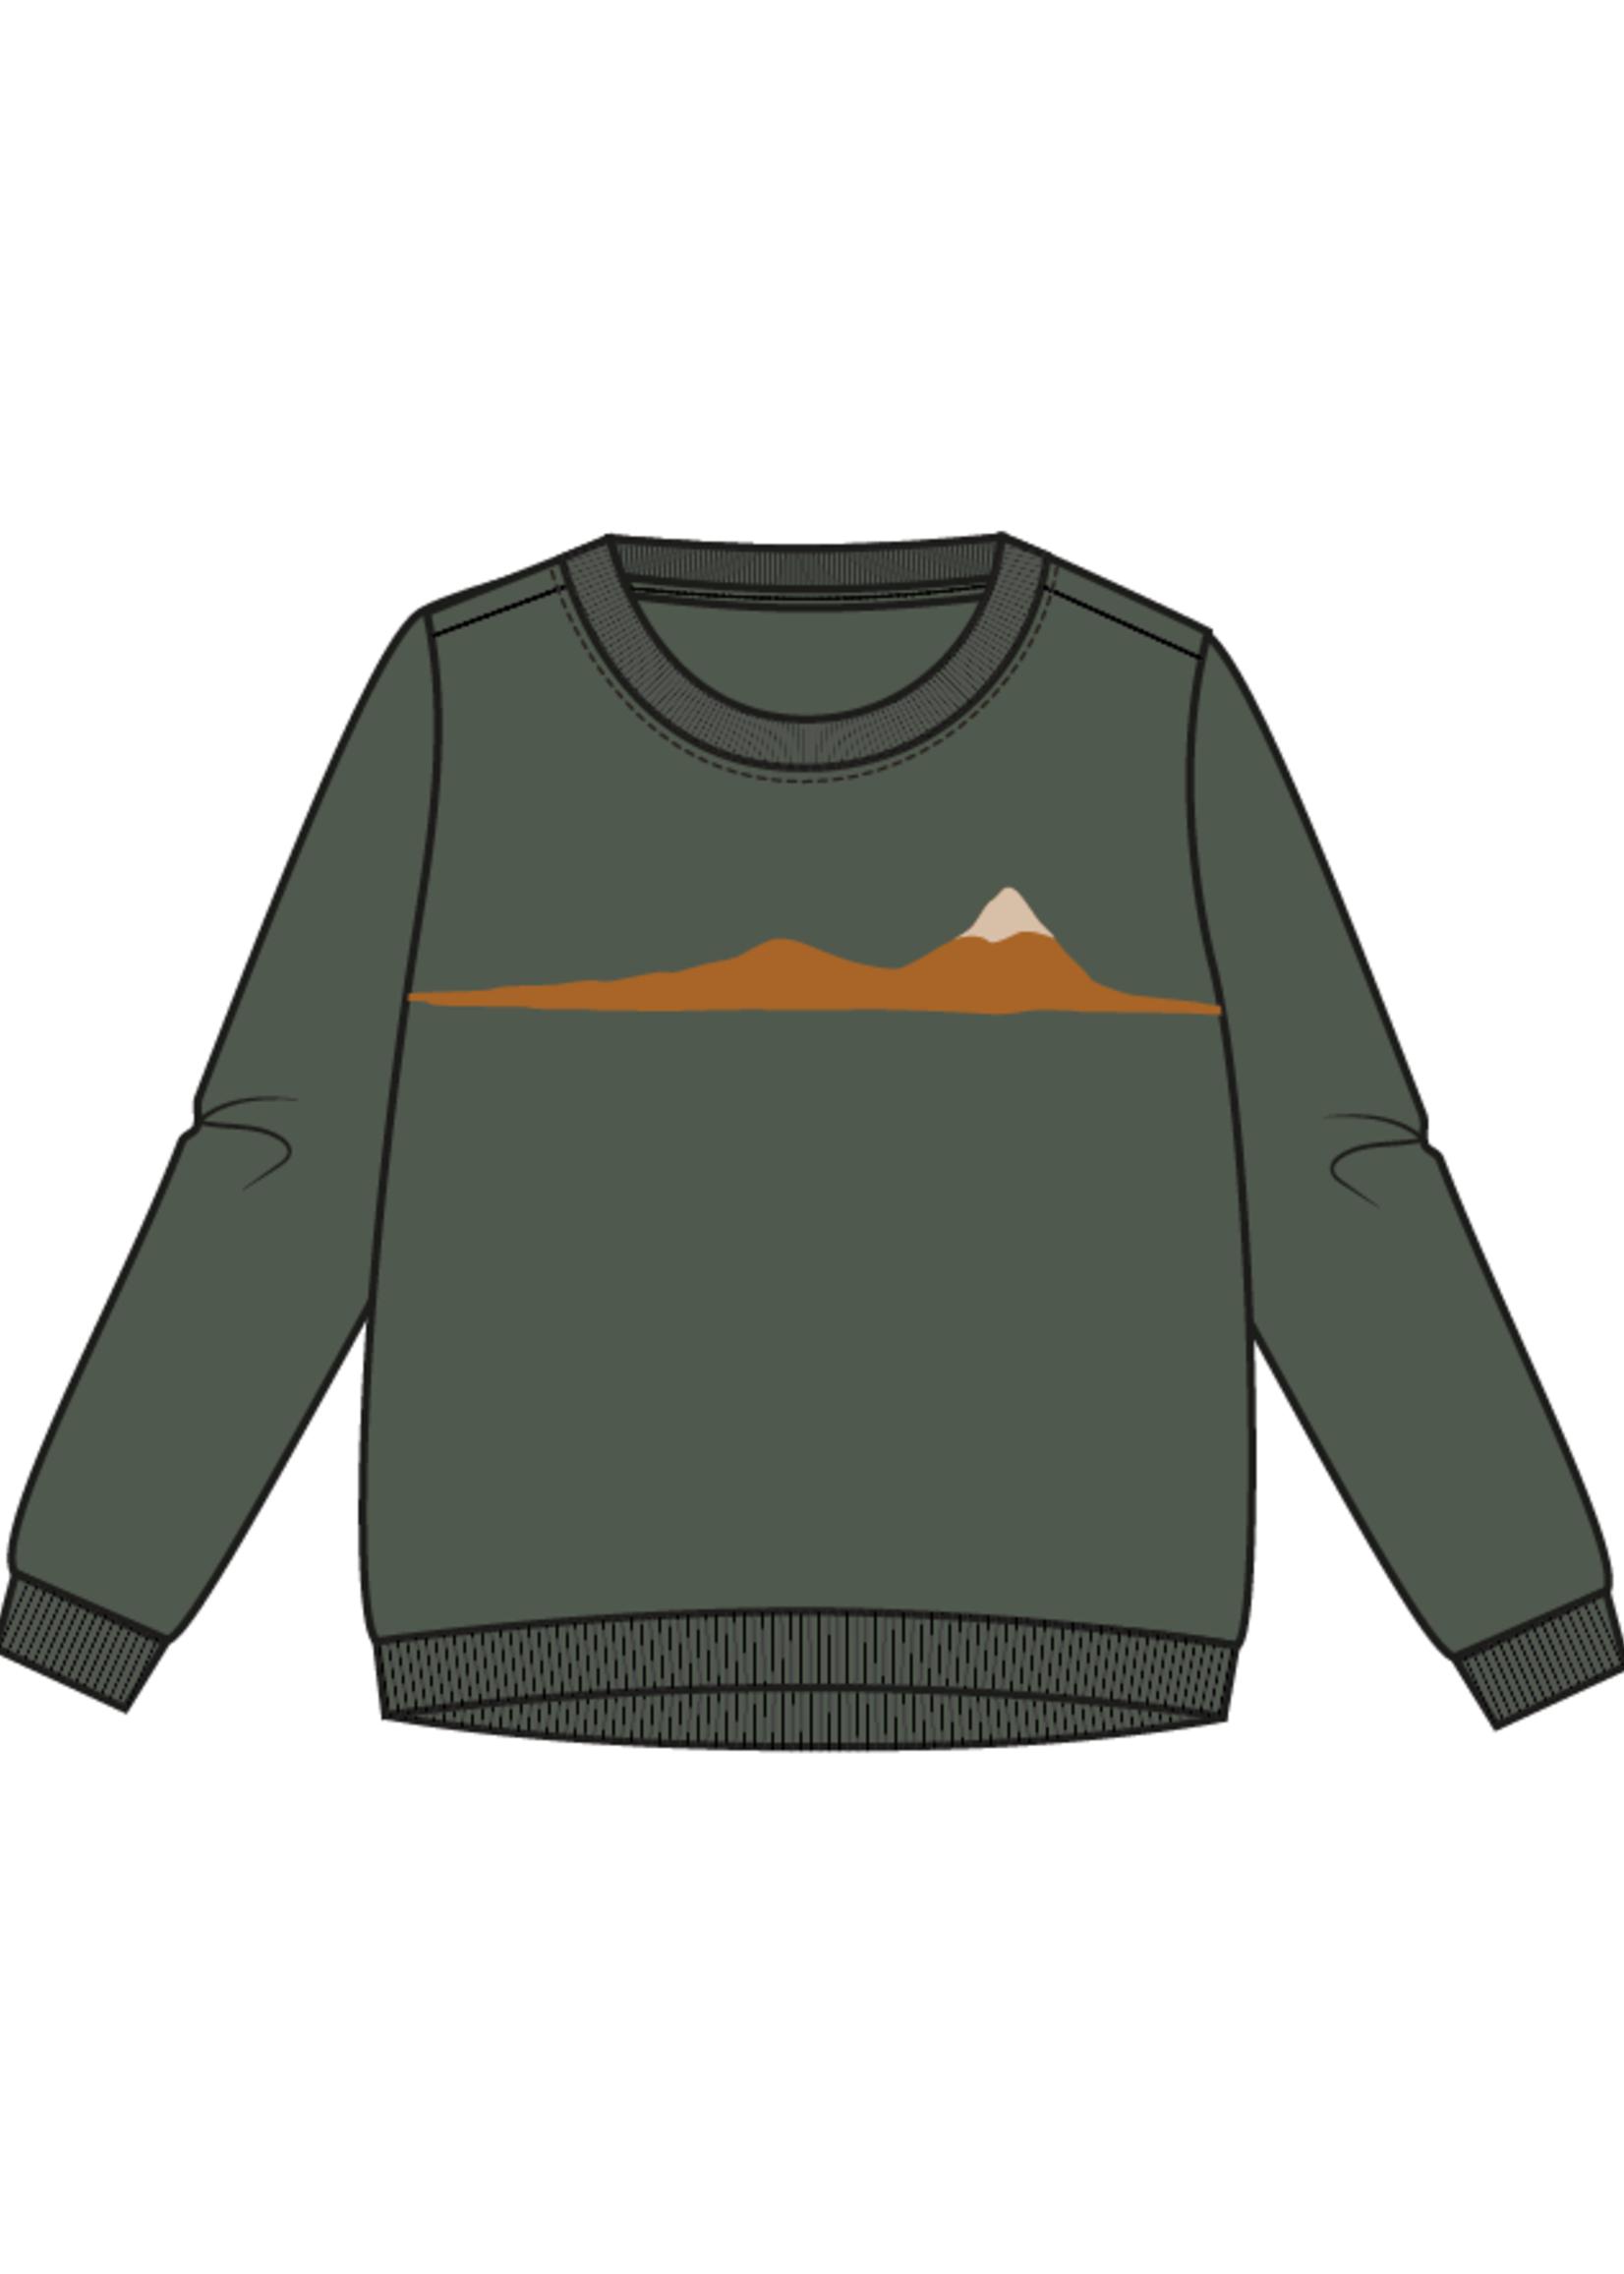 Blossom Kids Sweater - Snowy Mountain